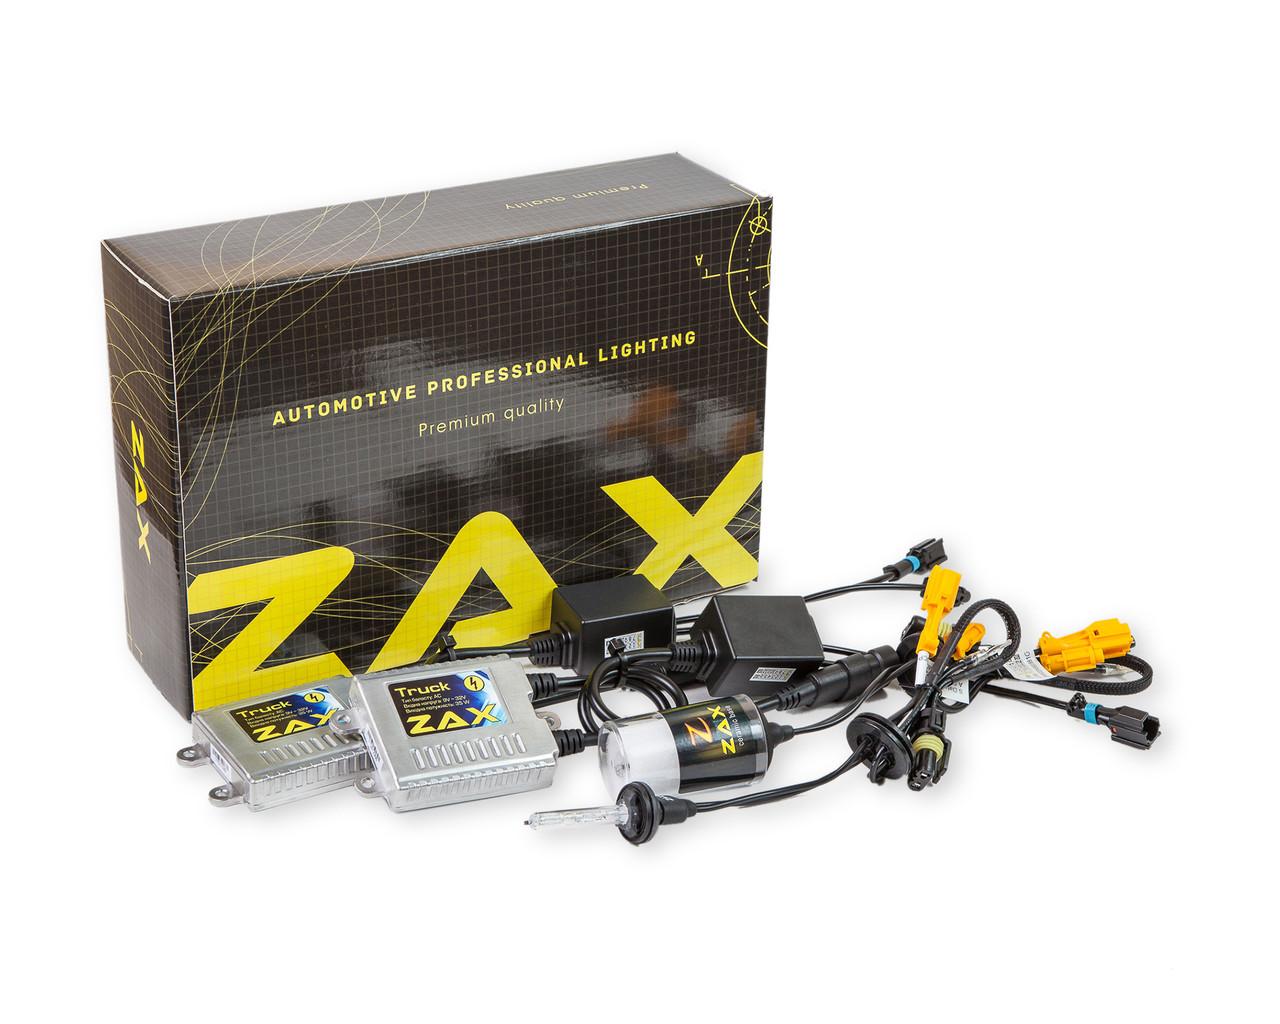 Комплект ксенона ZAX Truck 35W 9-32V H27 880 881 Ceramic 4300K, КОД: 147953